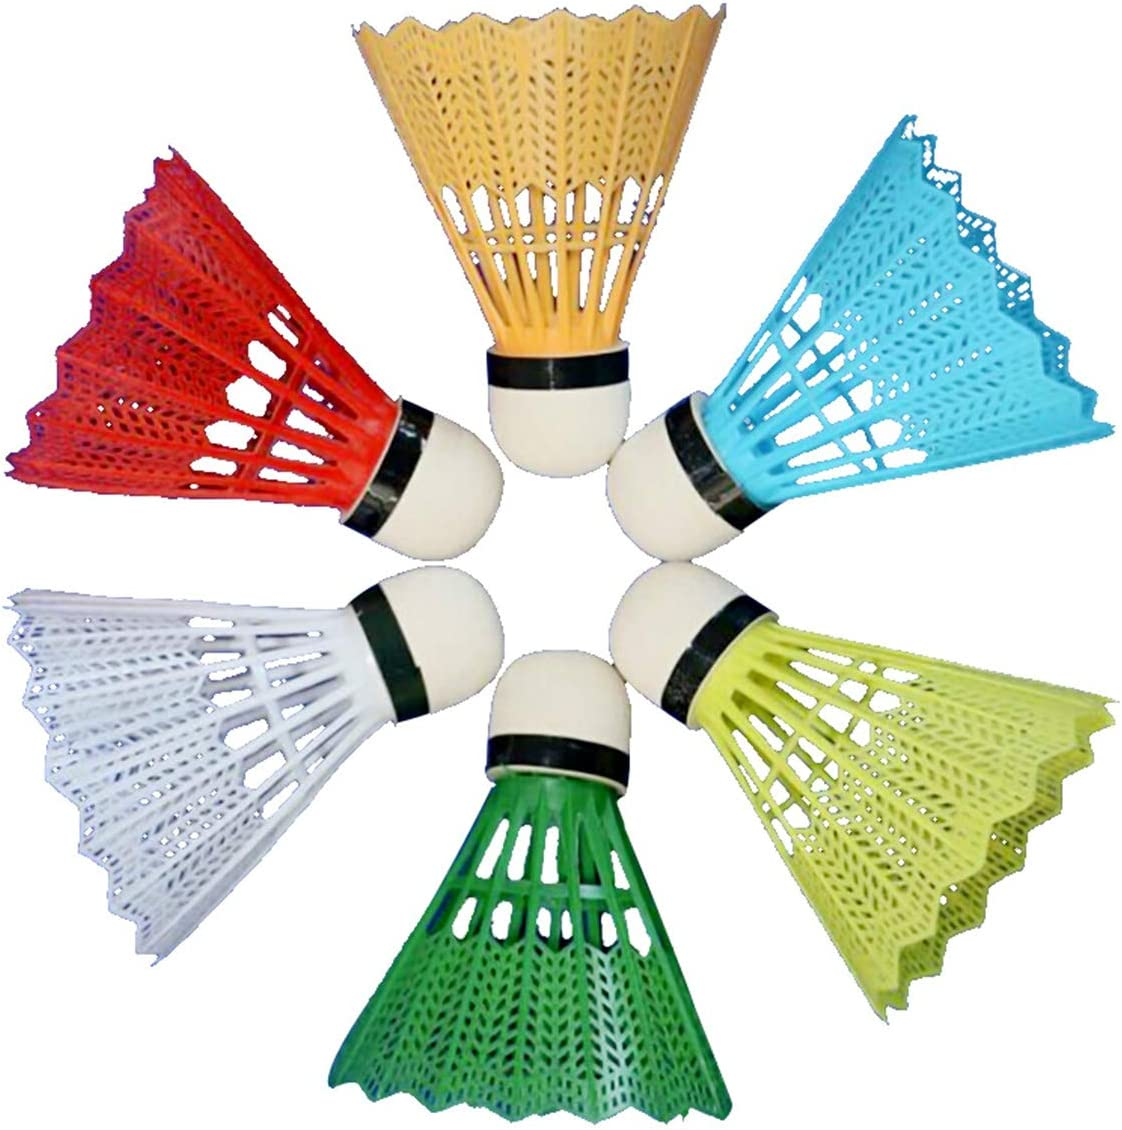 OhhGo 12 piezas pl/ástico de b/ádminton colorido ShuttleCocks para deportes al aire libre juego de fitness surtidos